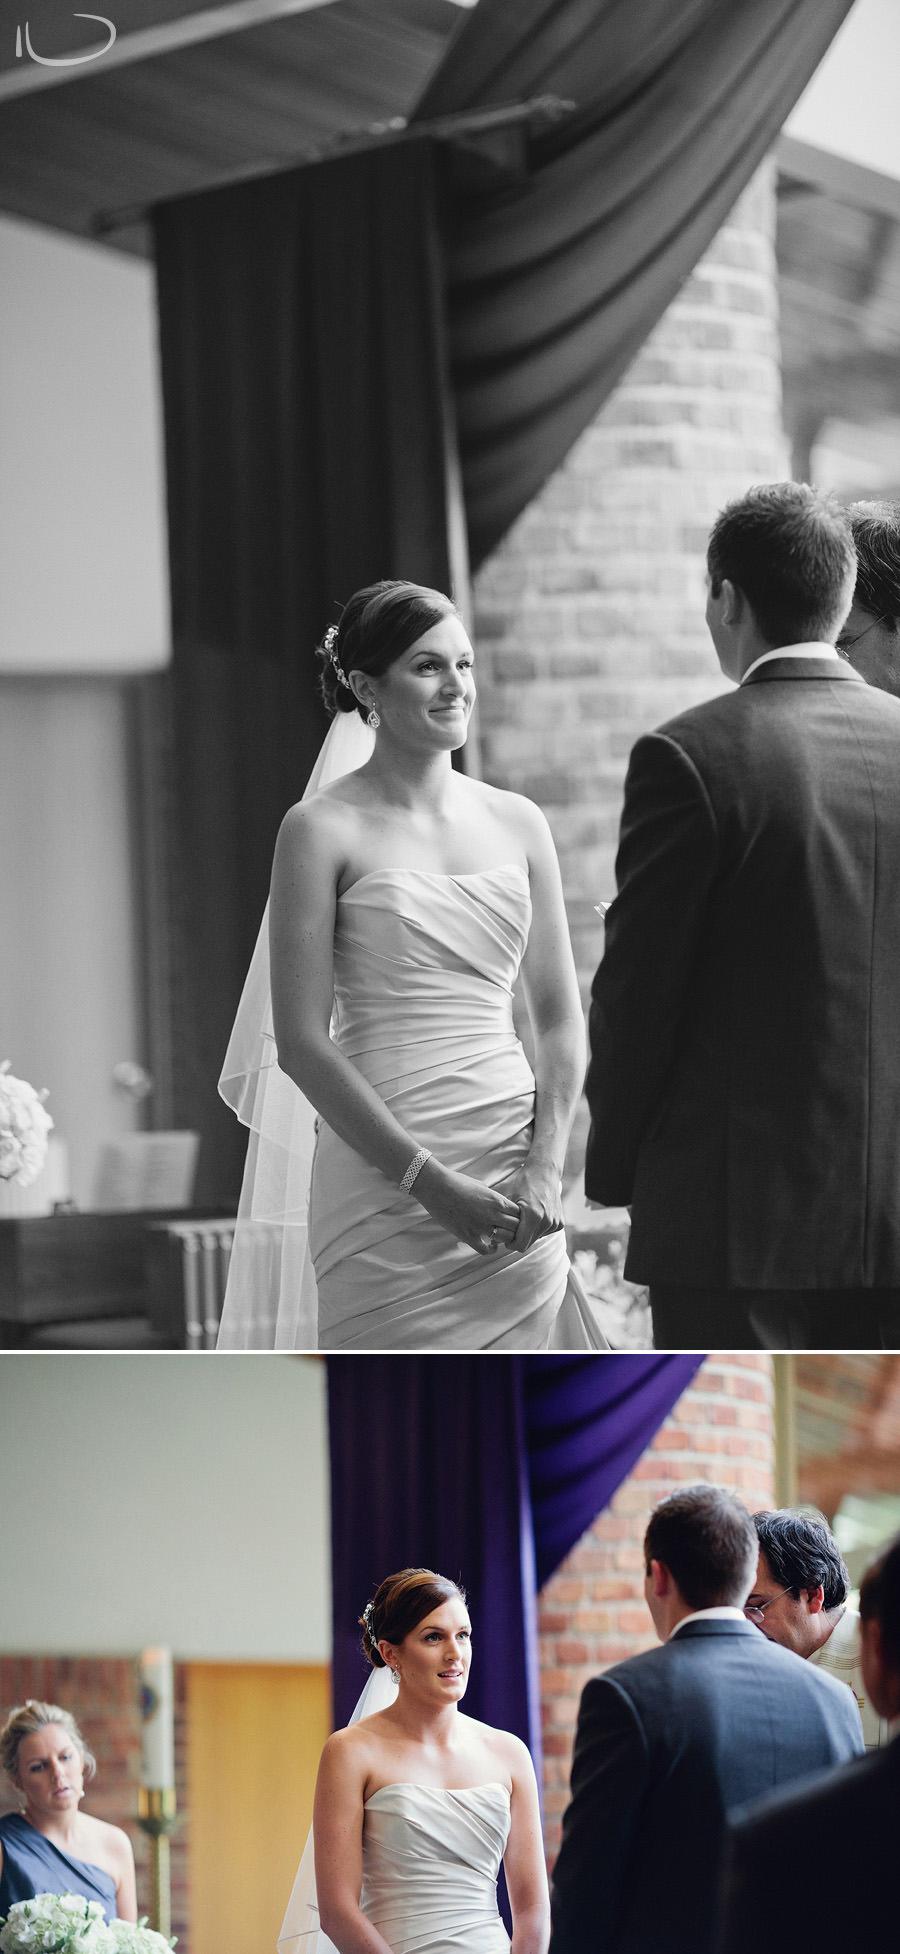 Wedding Photographers Canberra: Bride during ceremony